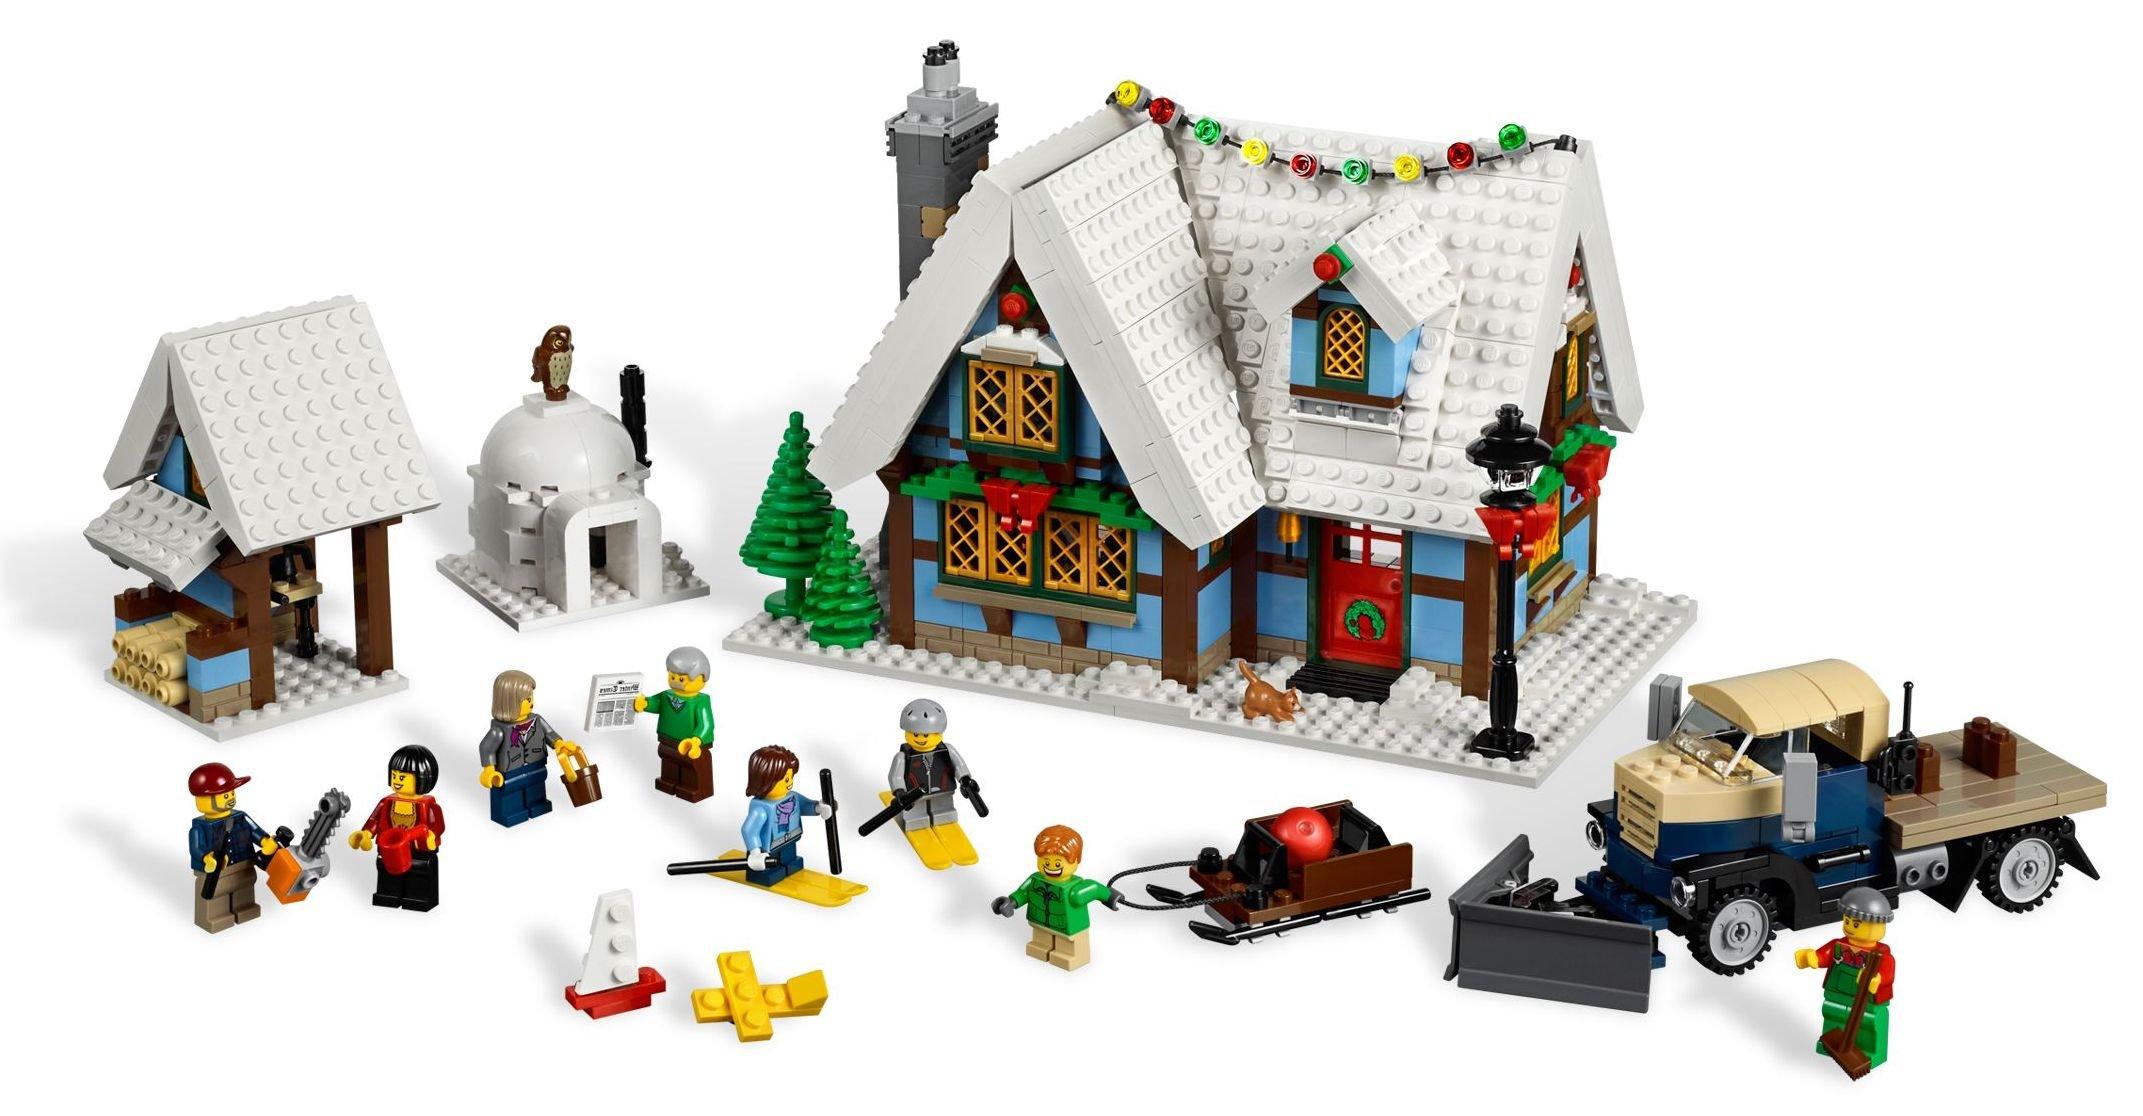 lego-10229-suggestions-Christmas-gift-ibrickcity